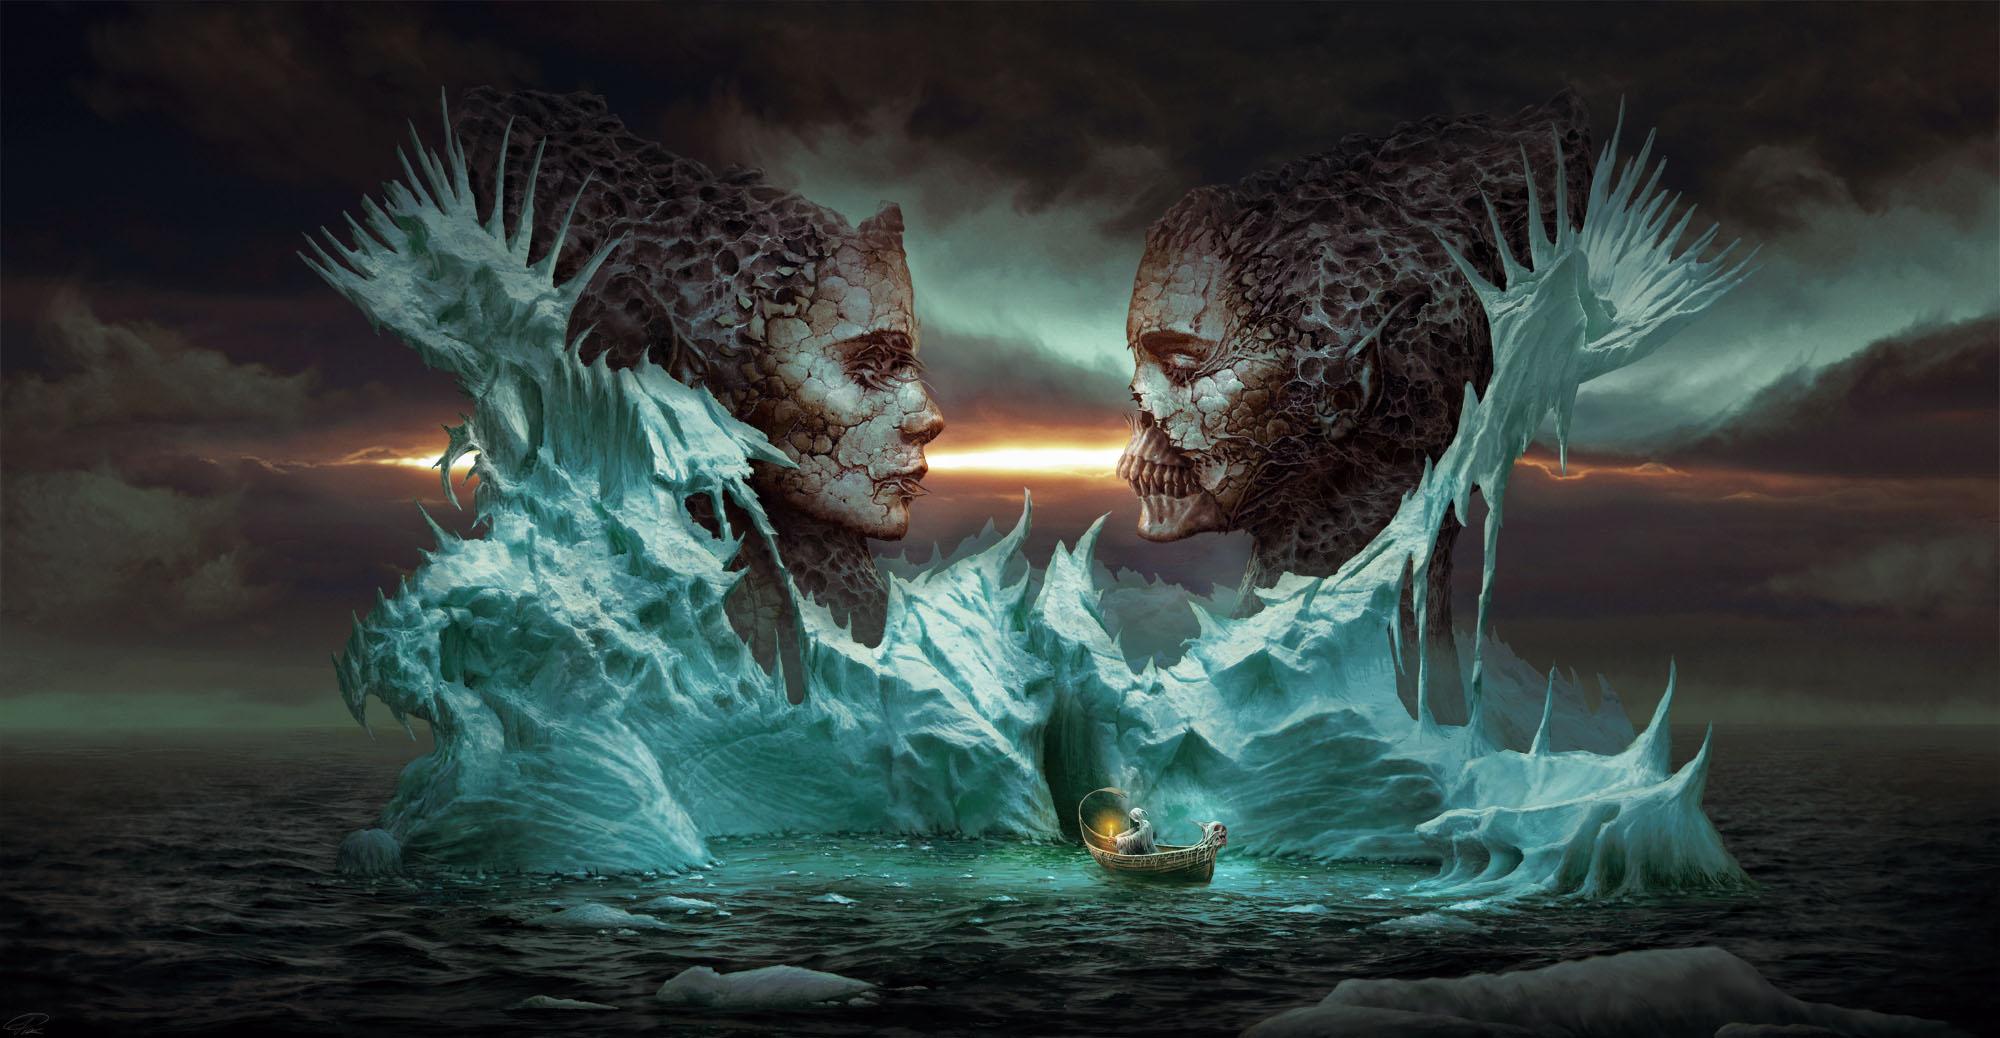 The Dark Fantasy Art of Piotr Ruszkowski | Digital Artist